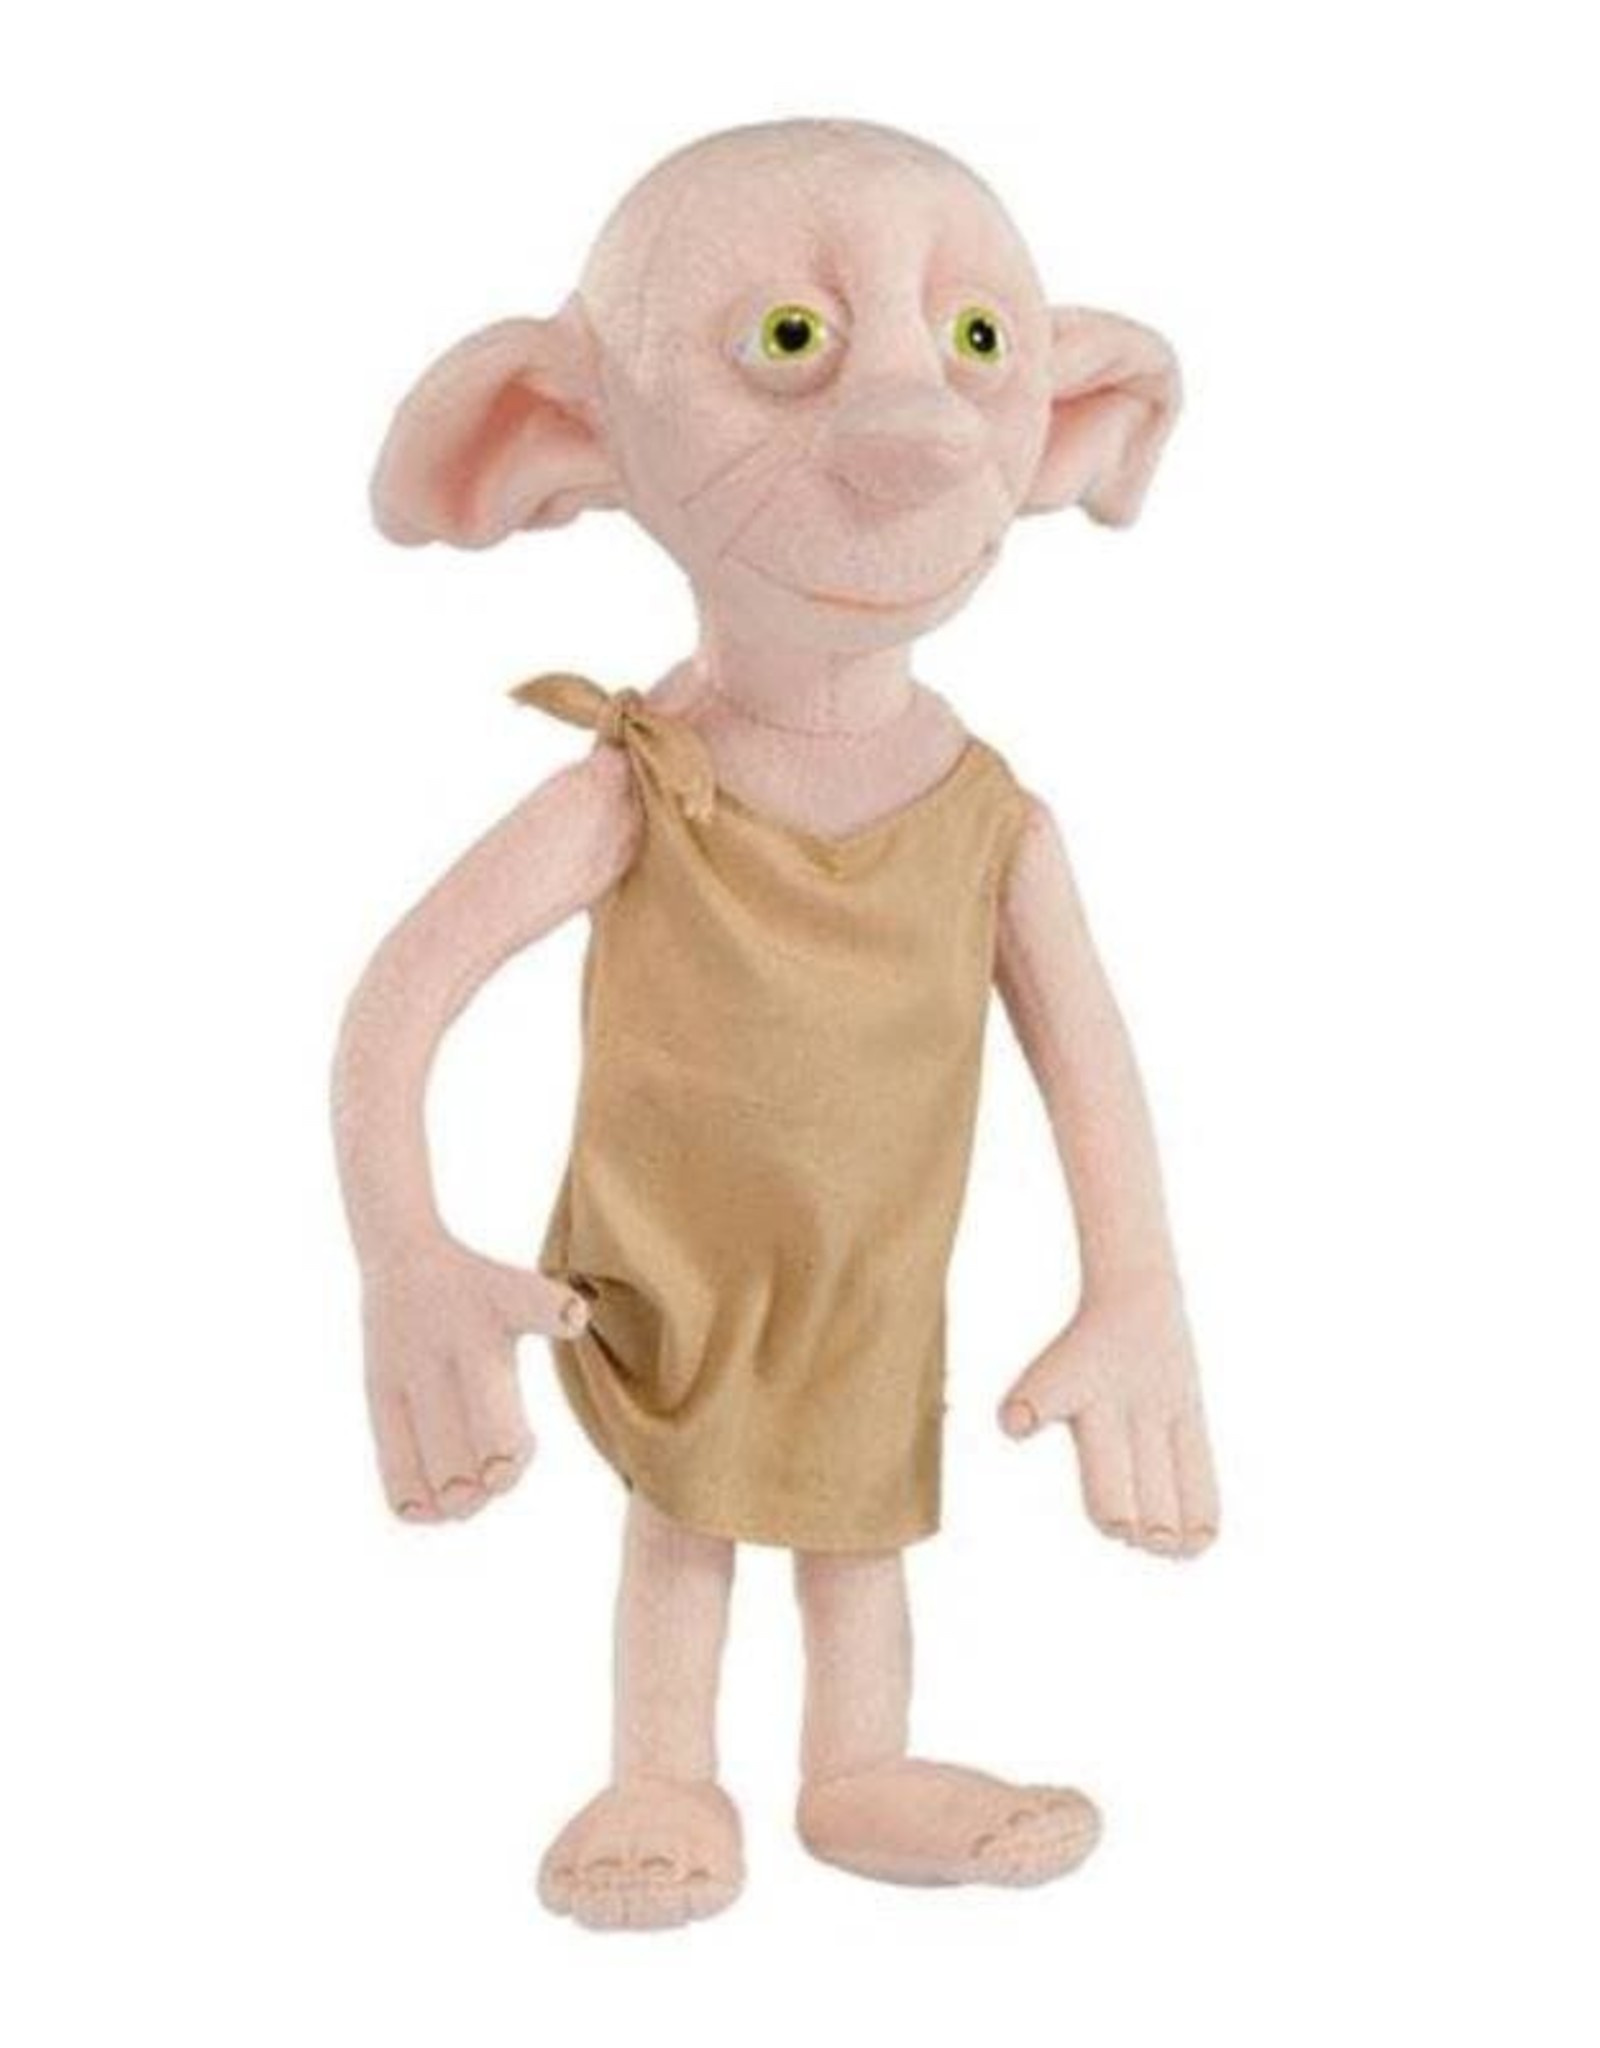 Harry Potter Merchandise toys - Harry Potter Dobby Pluche